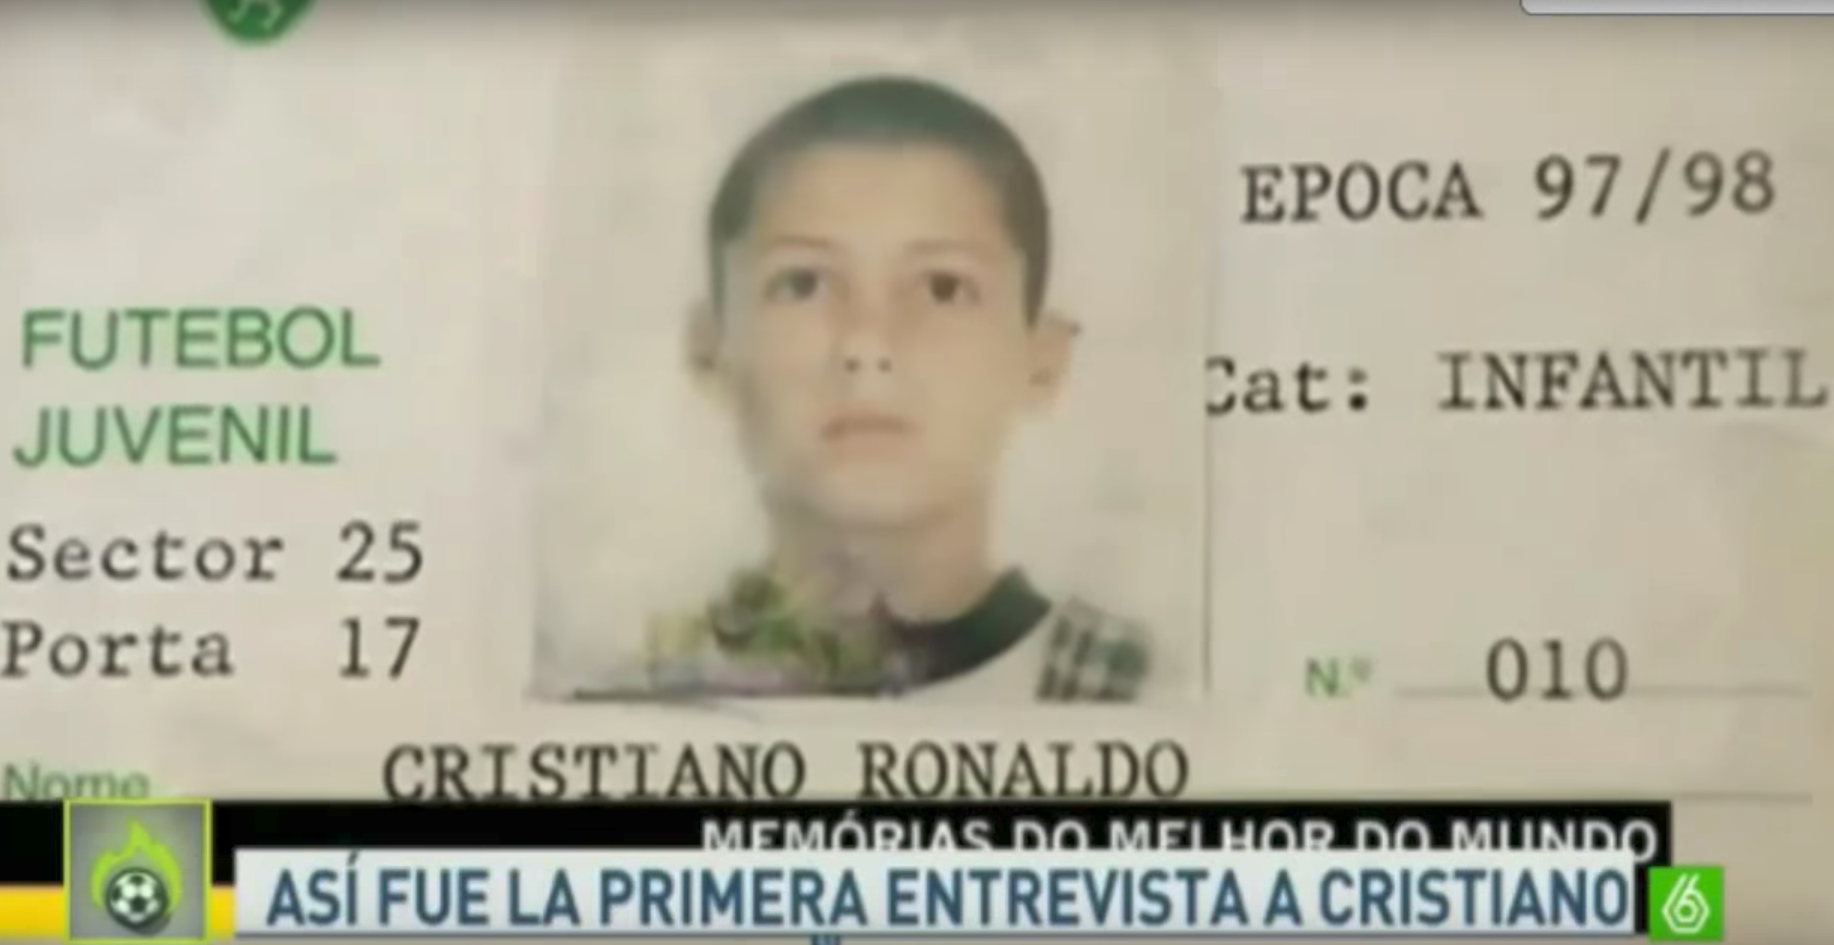 Cristiano Ronaldo, primer entrevista, televisión, 16 años, promesa, Sporting de Lisboa, trayectoria